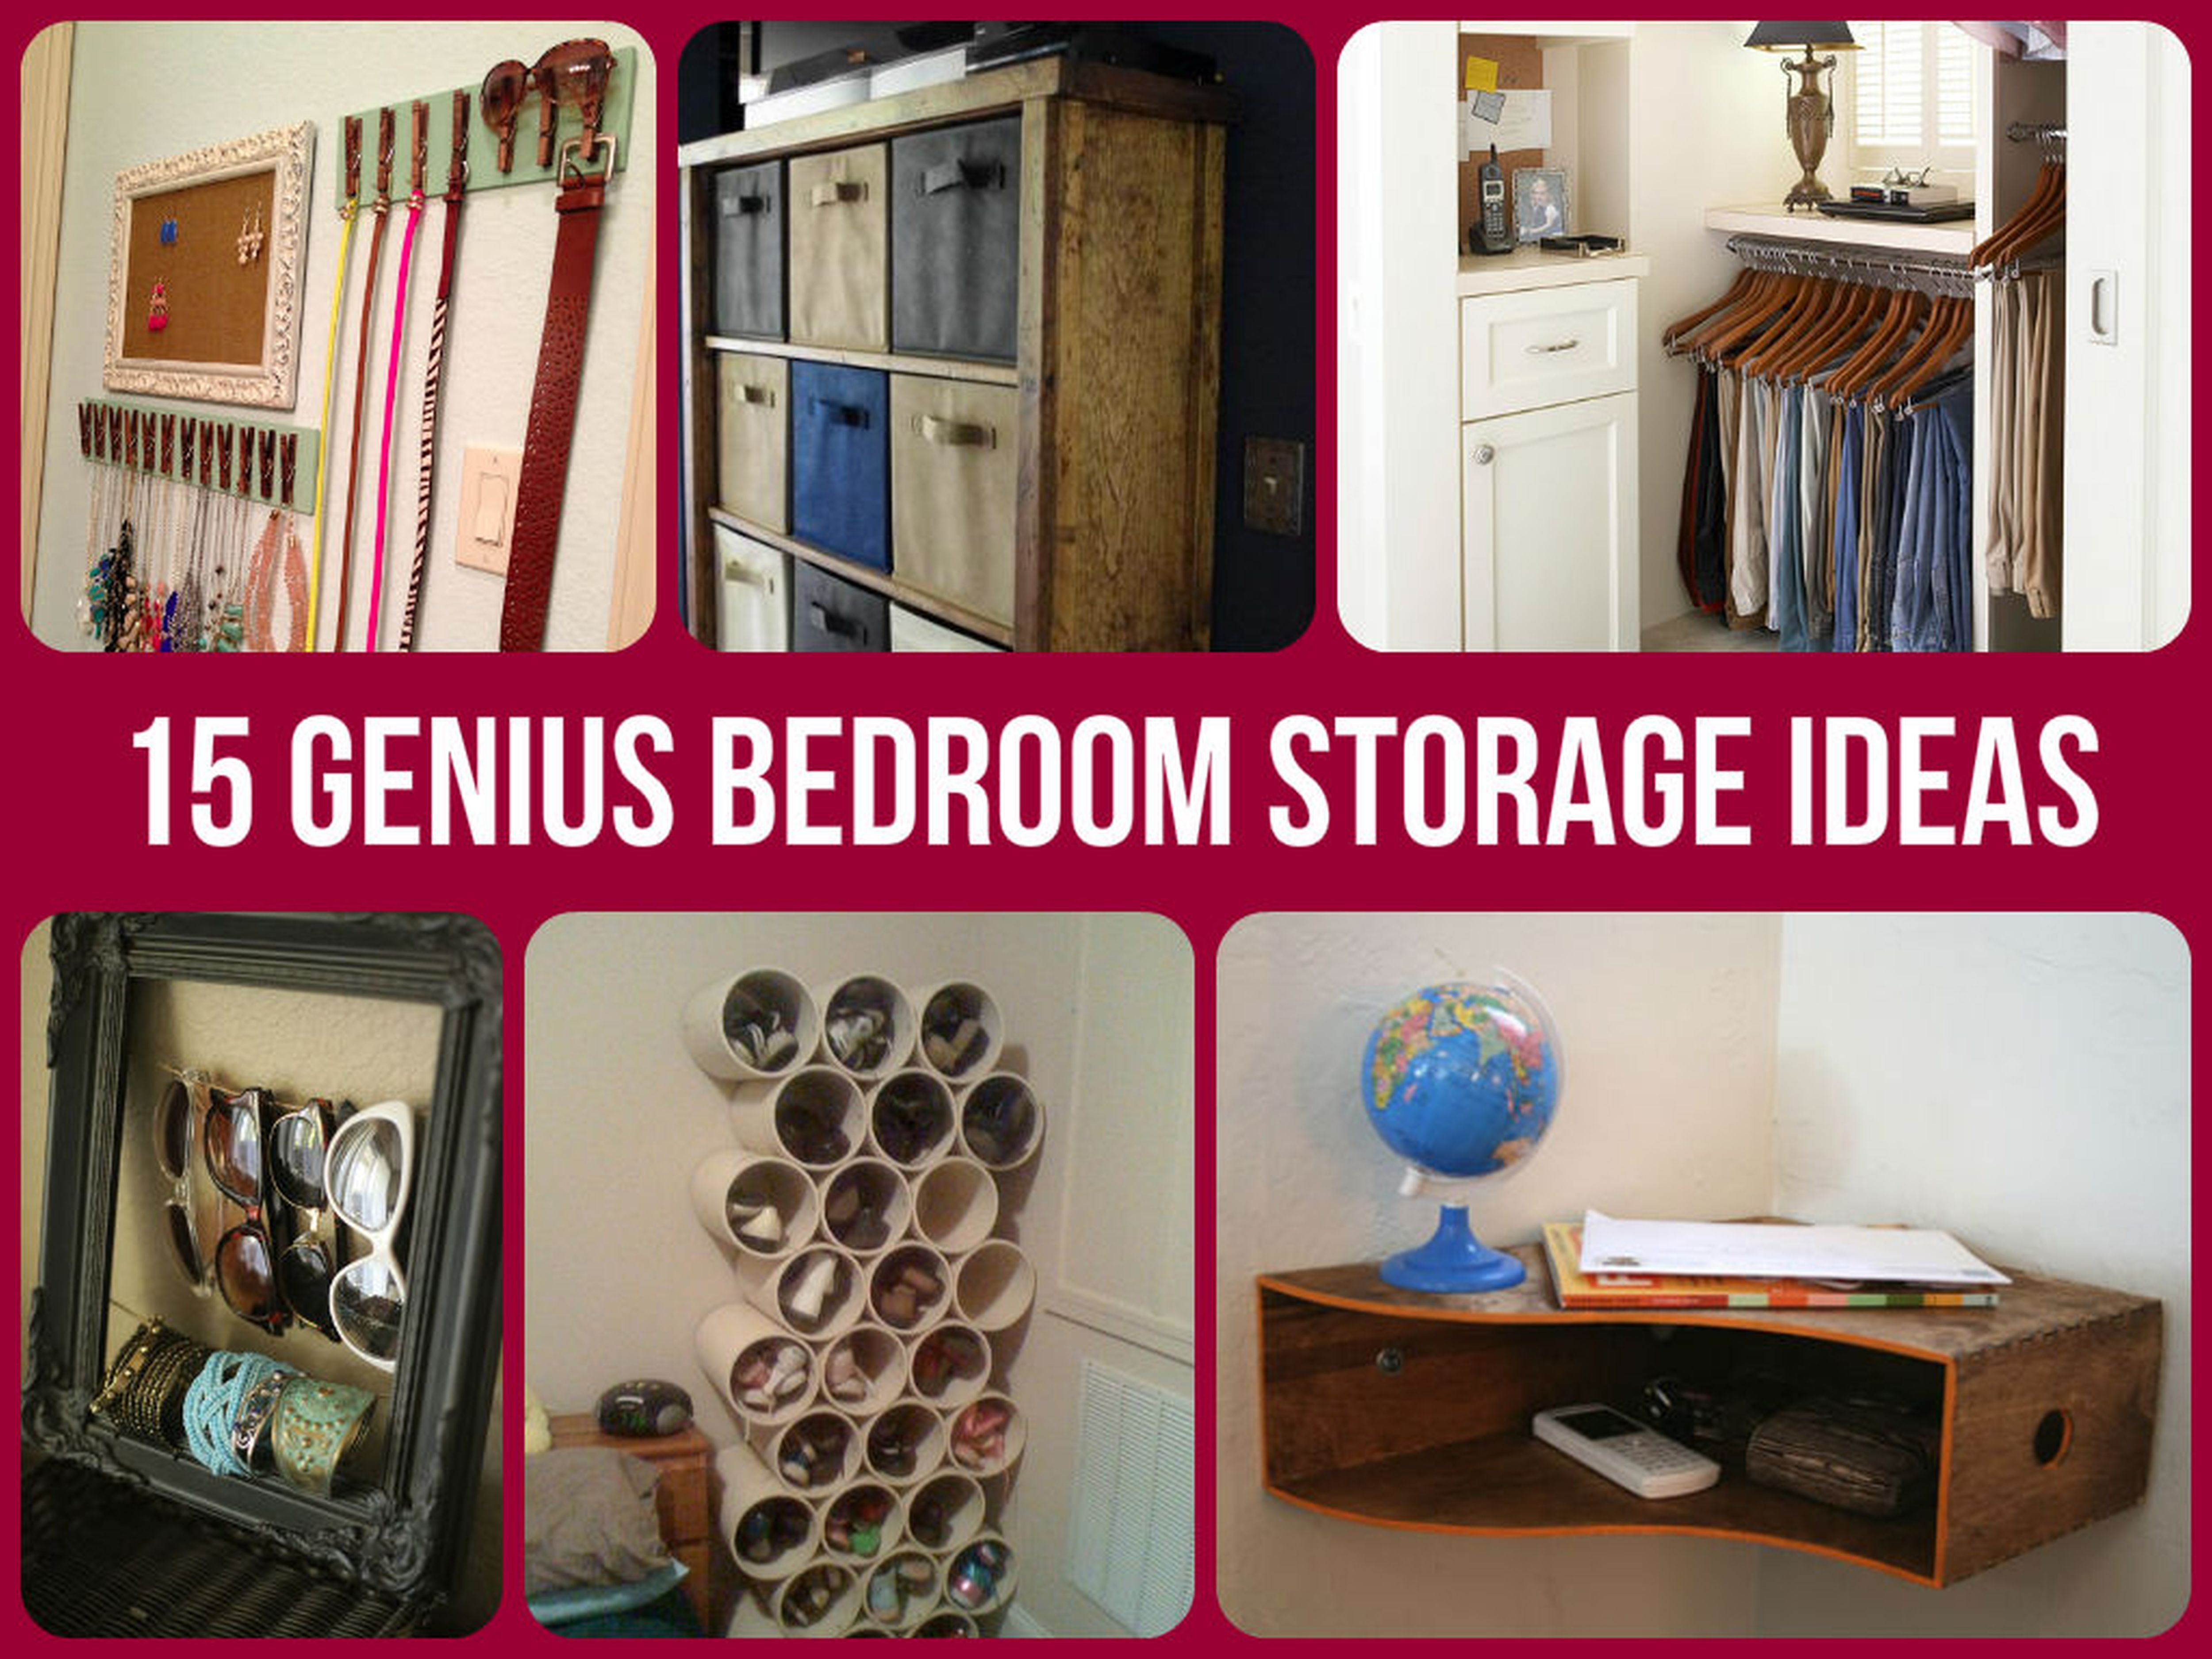 Diy Apartment Ideas apartment bedroom diy small closet ideas your storage system